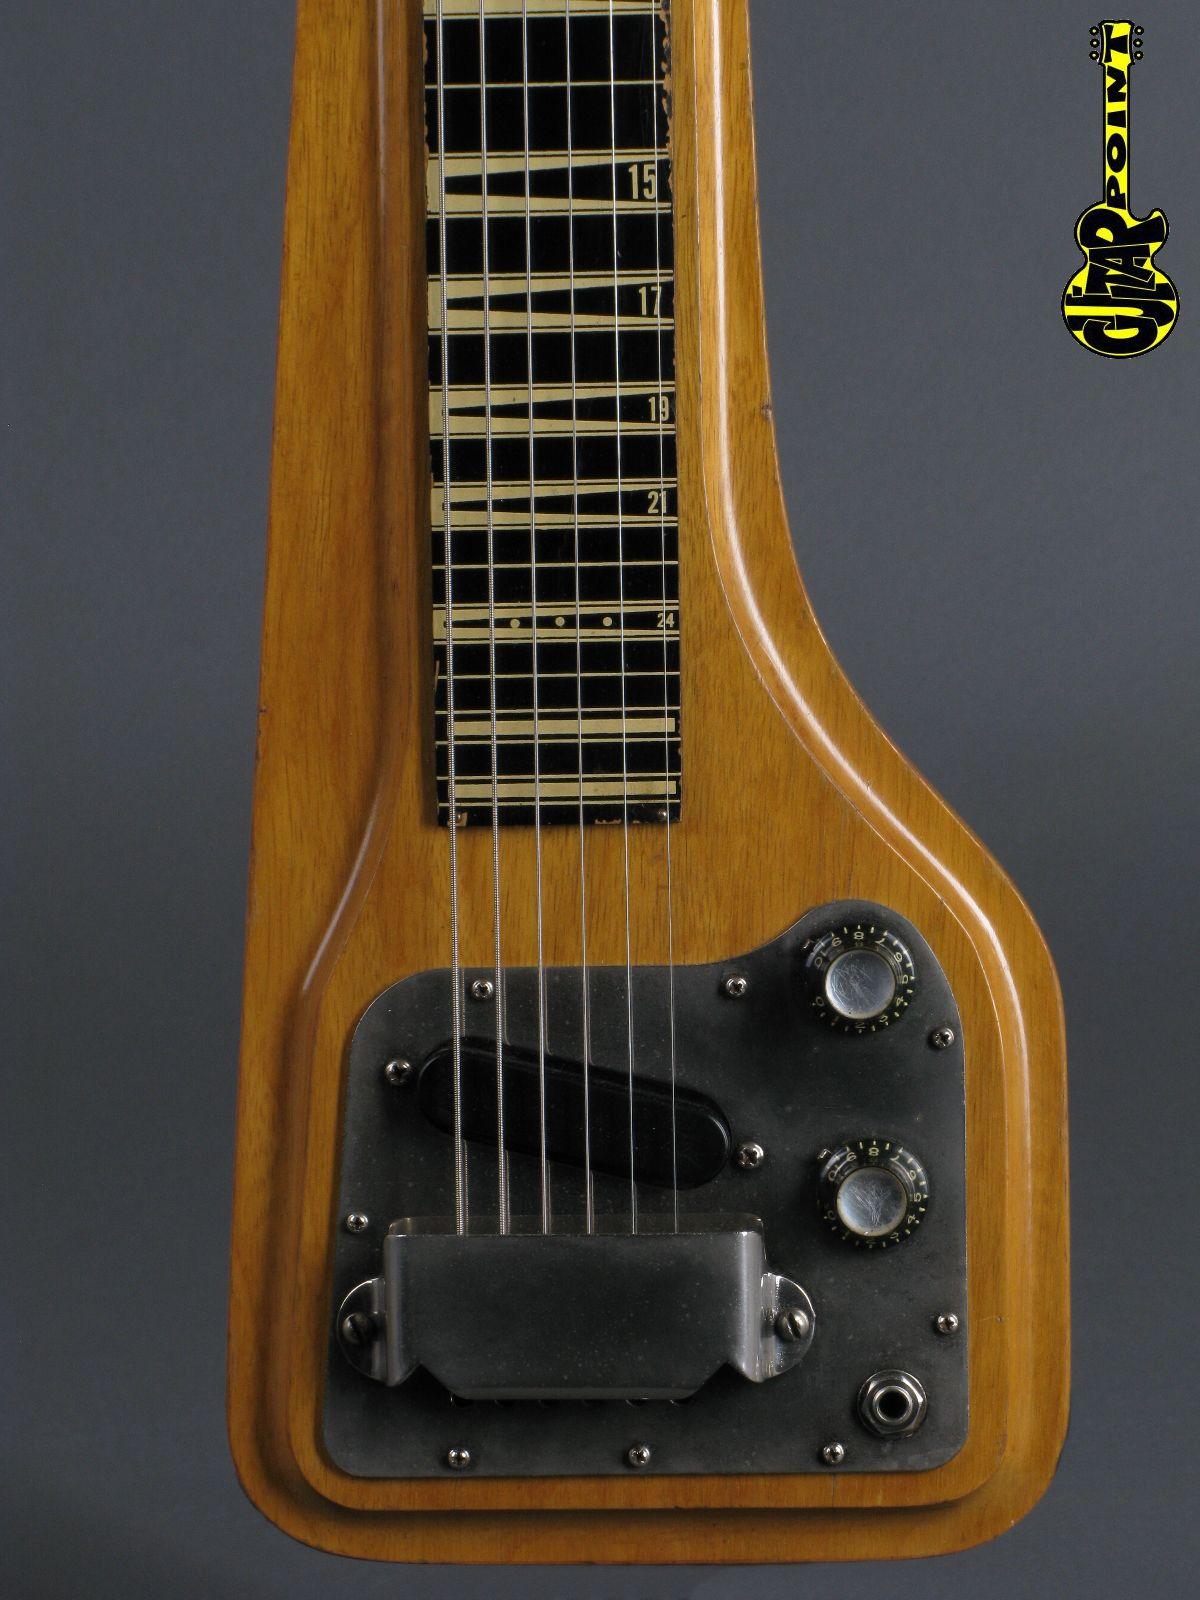 1964 GIBSON EH-500 SKYLARK Lap Steel Guitar